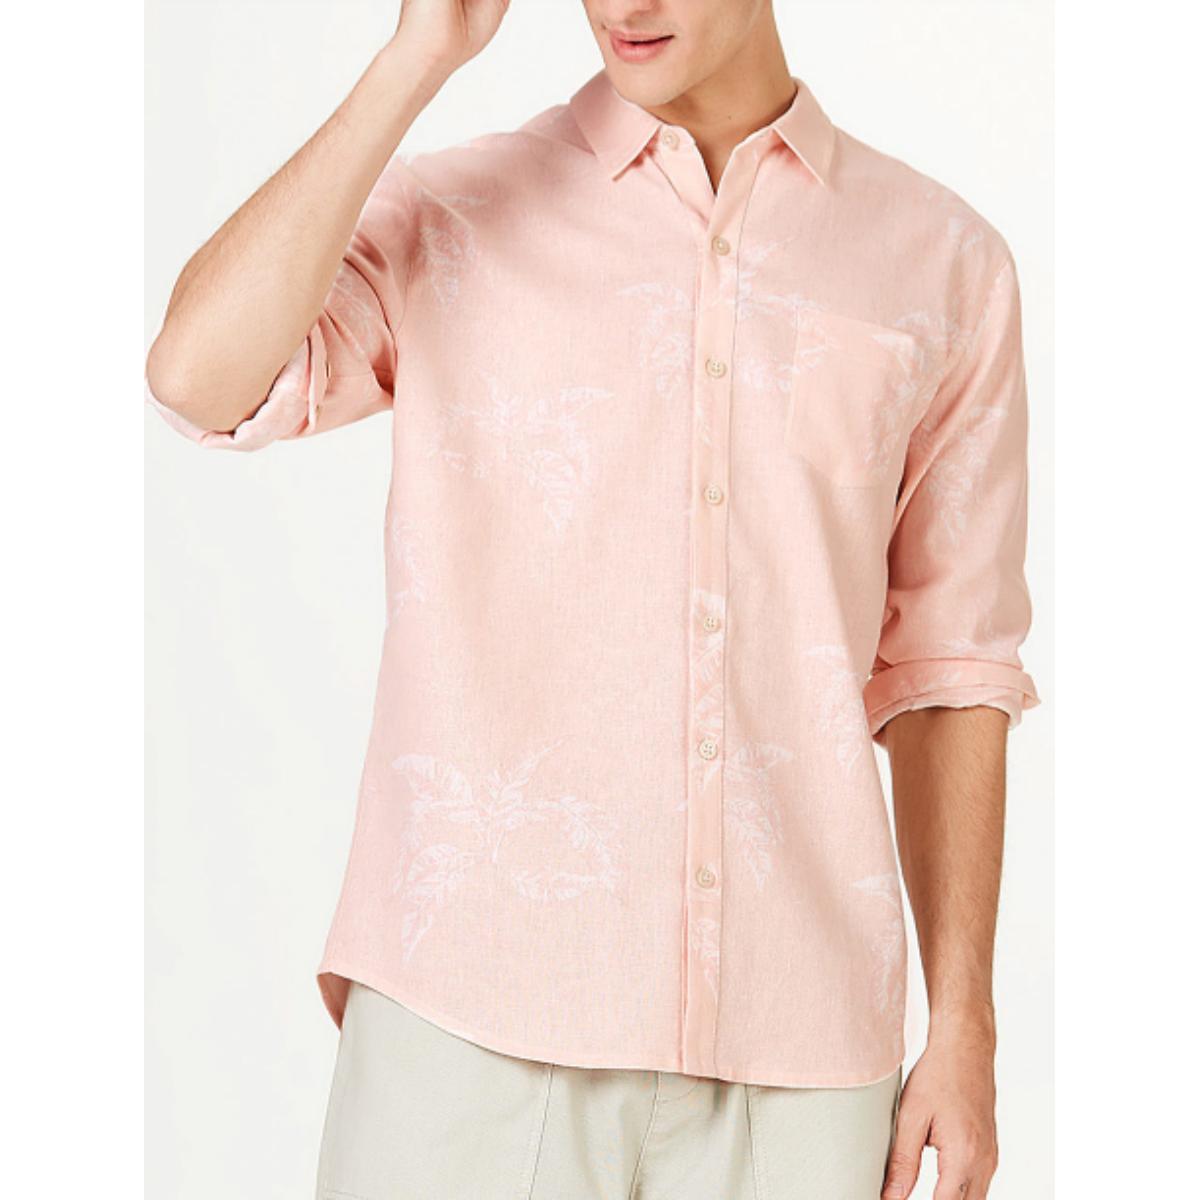 Camisa Masculina Hering Ktz4 1bsi Rosa